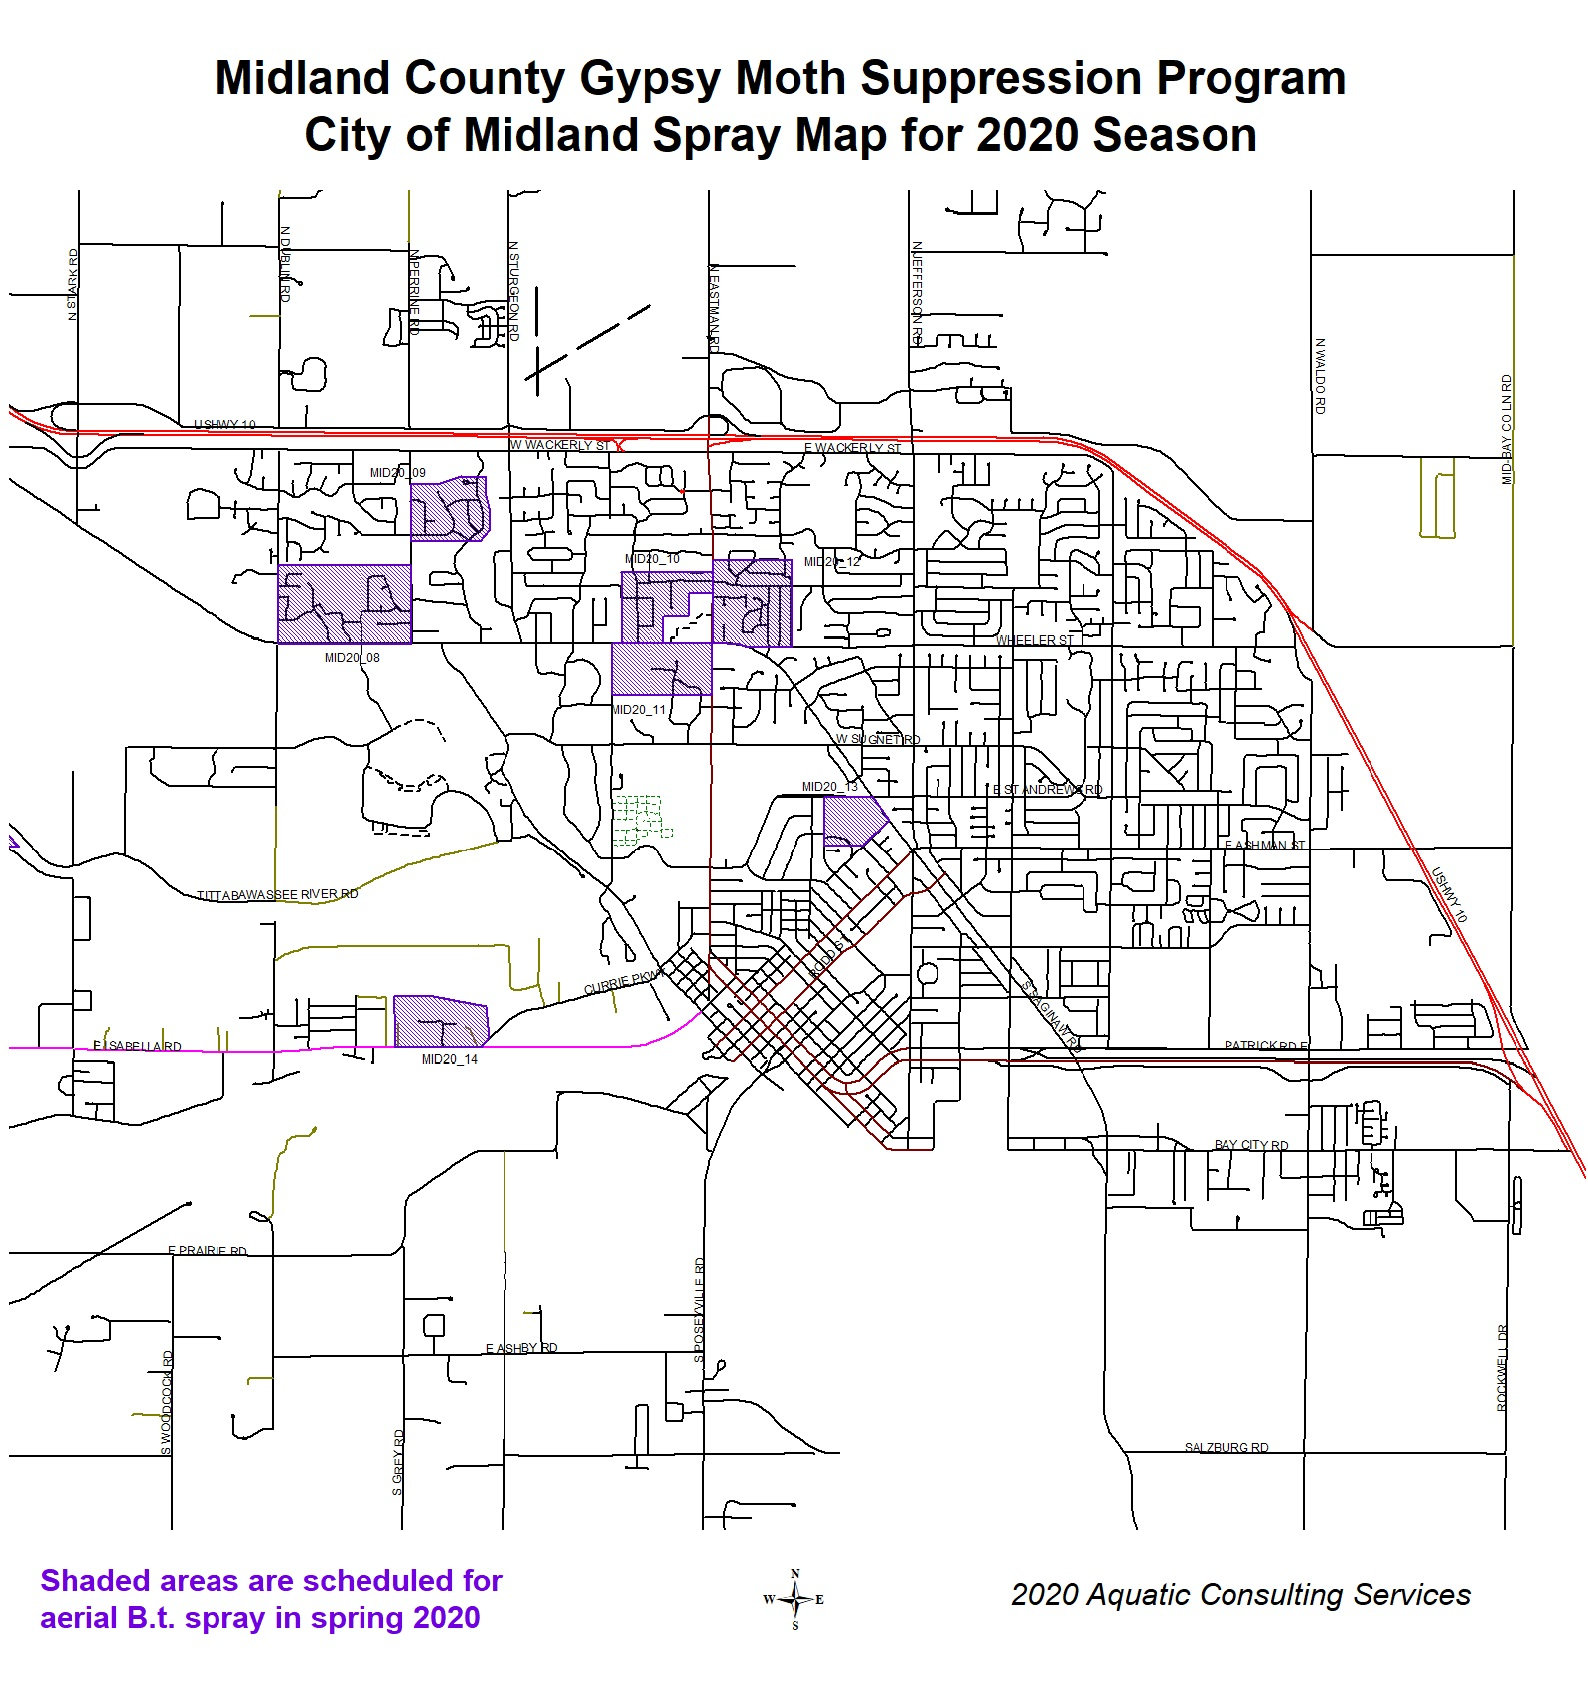 MidCitySpray20_Map